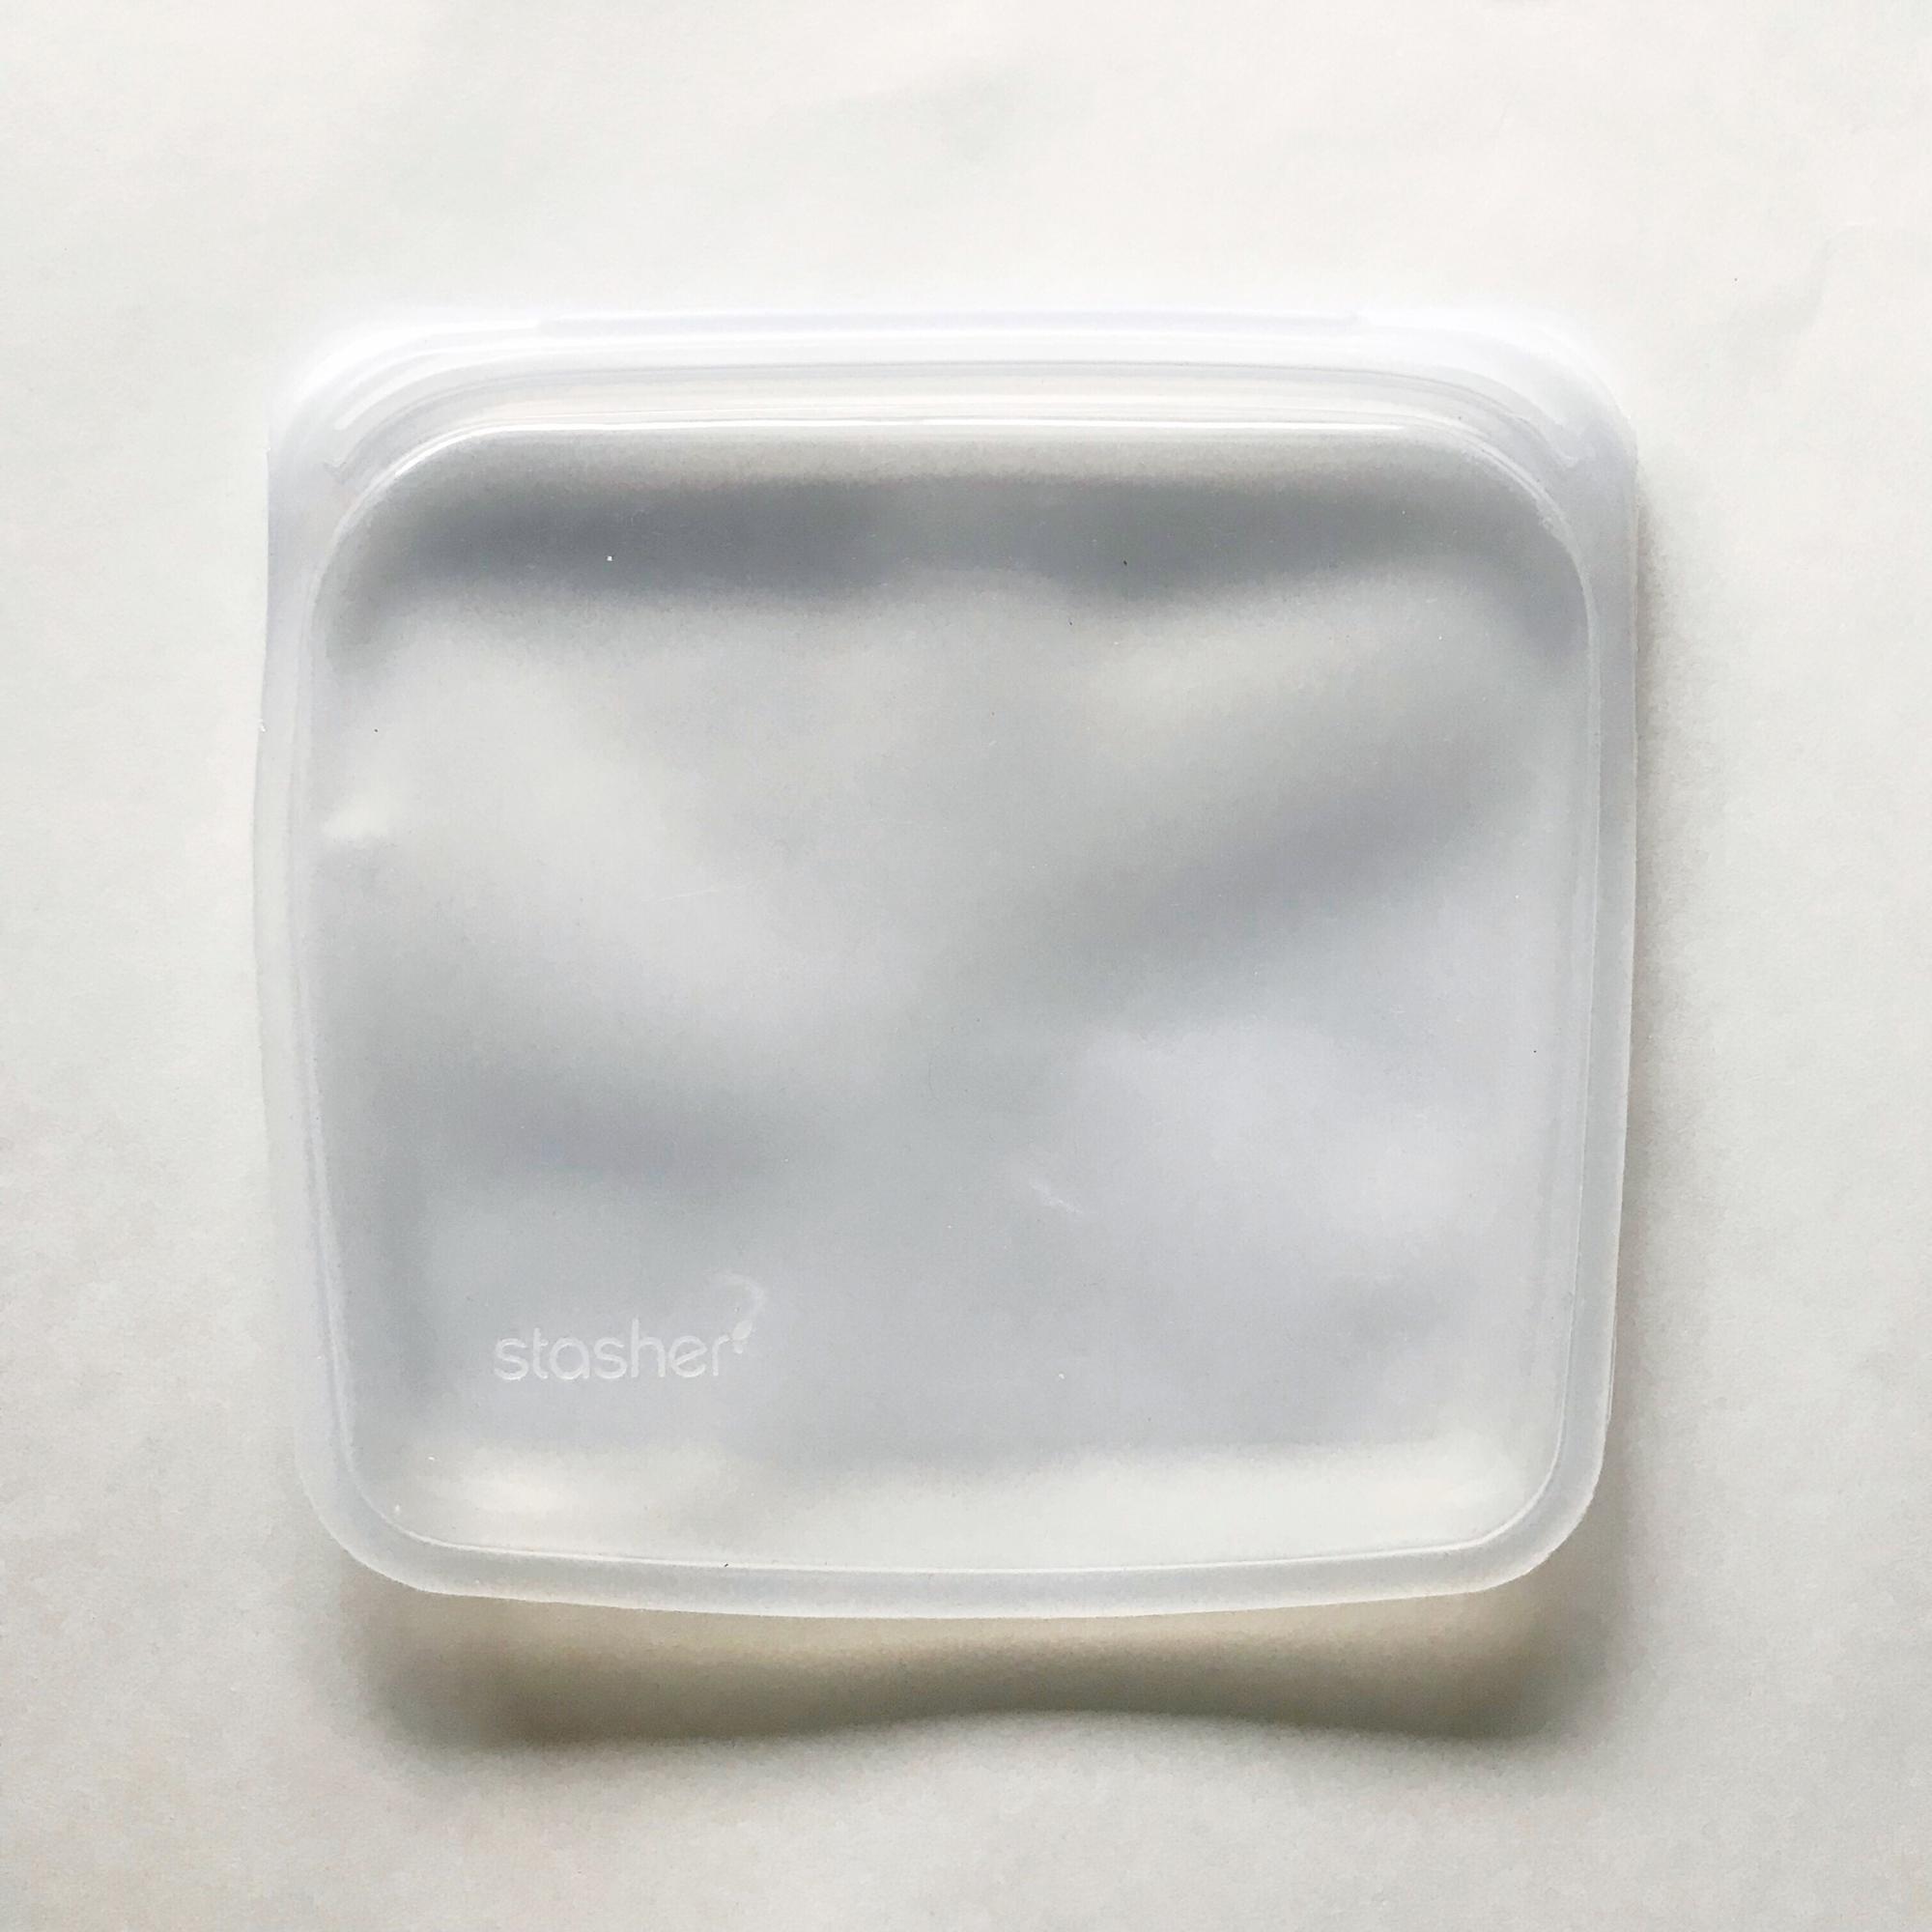 MightyFix Stasher silicone sandwich bag — Cotton Cashmere Cat Hair